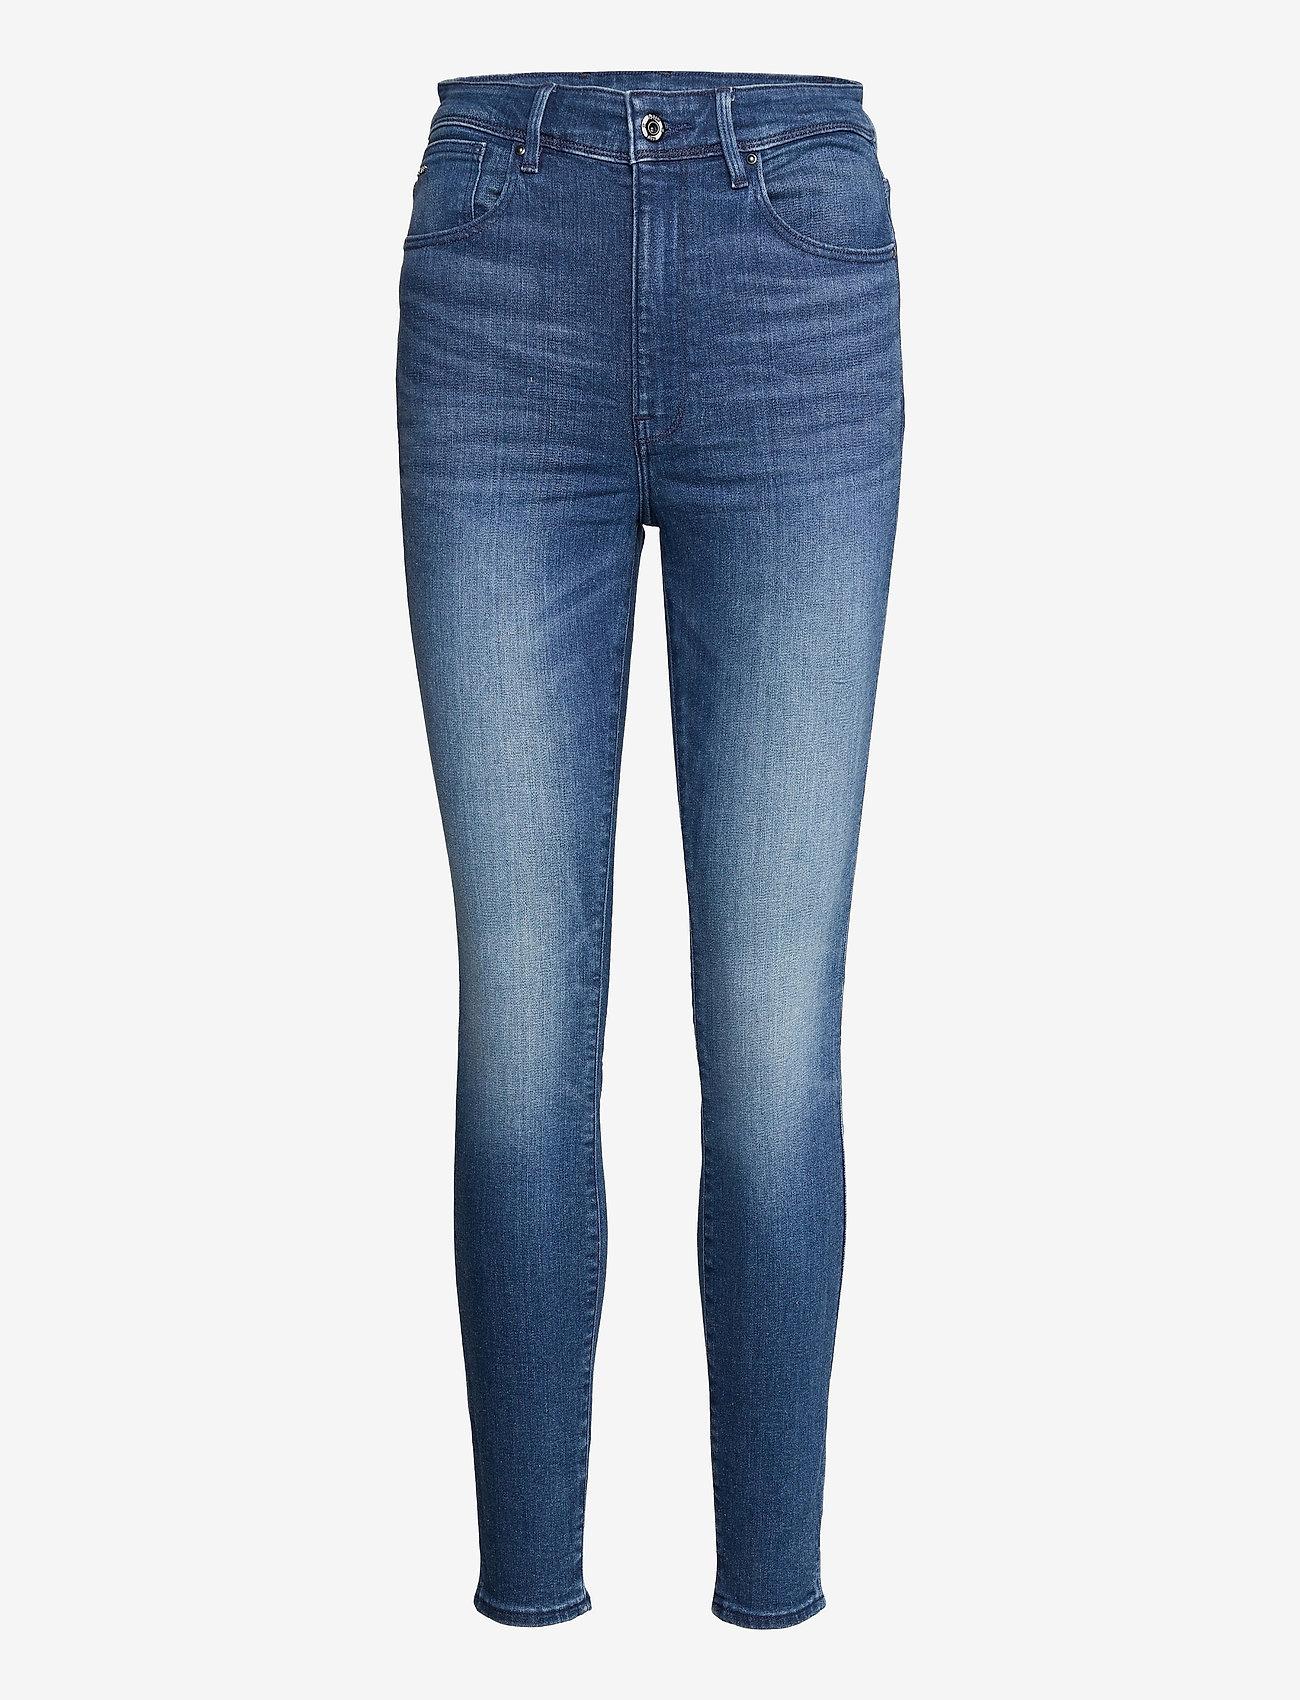 G-star RAW - Kafey Ultra High Skinny Wmn - skinny jeans - faded neptune blue - 0